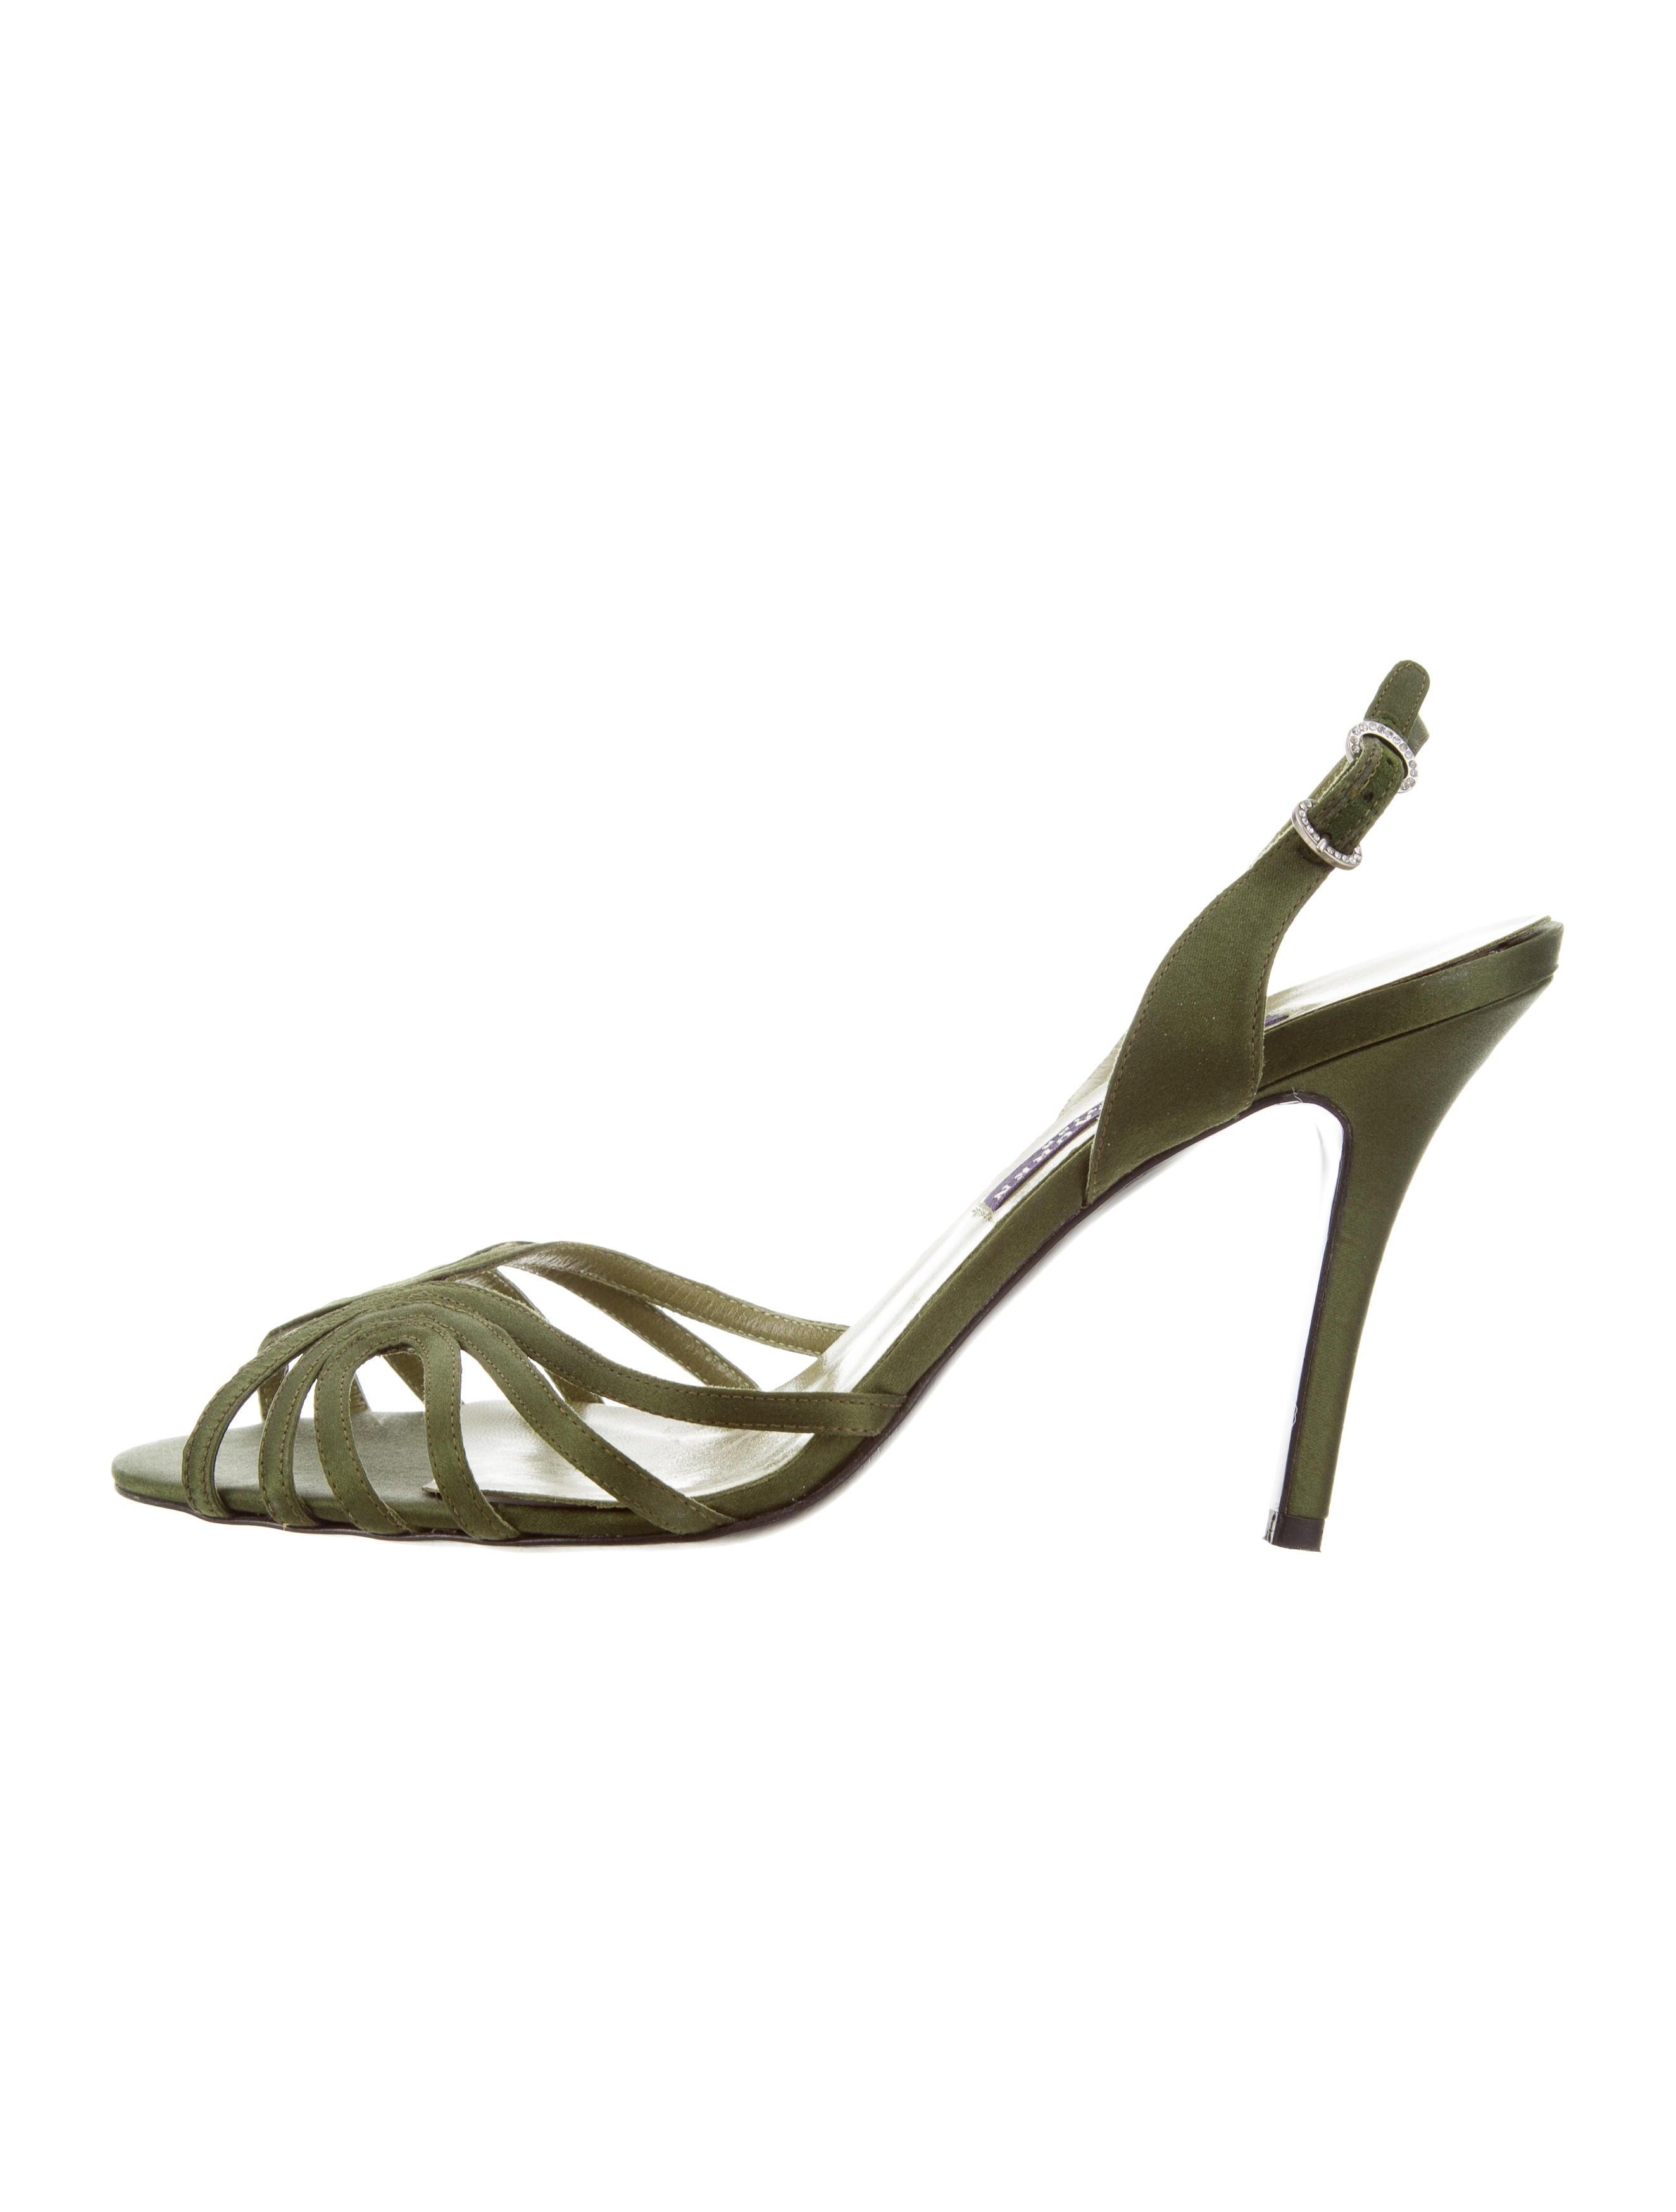 Ralph Lauren Purple Label Satin Multistrap Sandals best seller online original cheap online buy cheap pictures KIkrOMBH